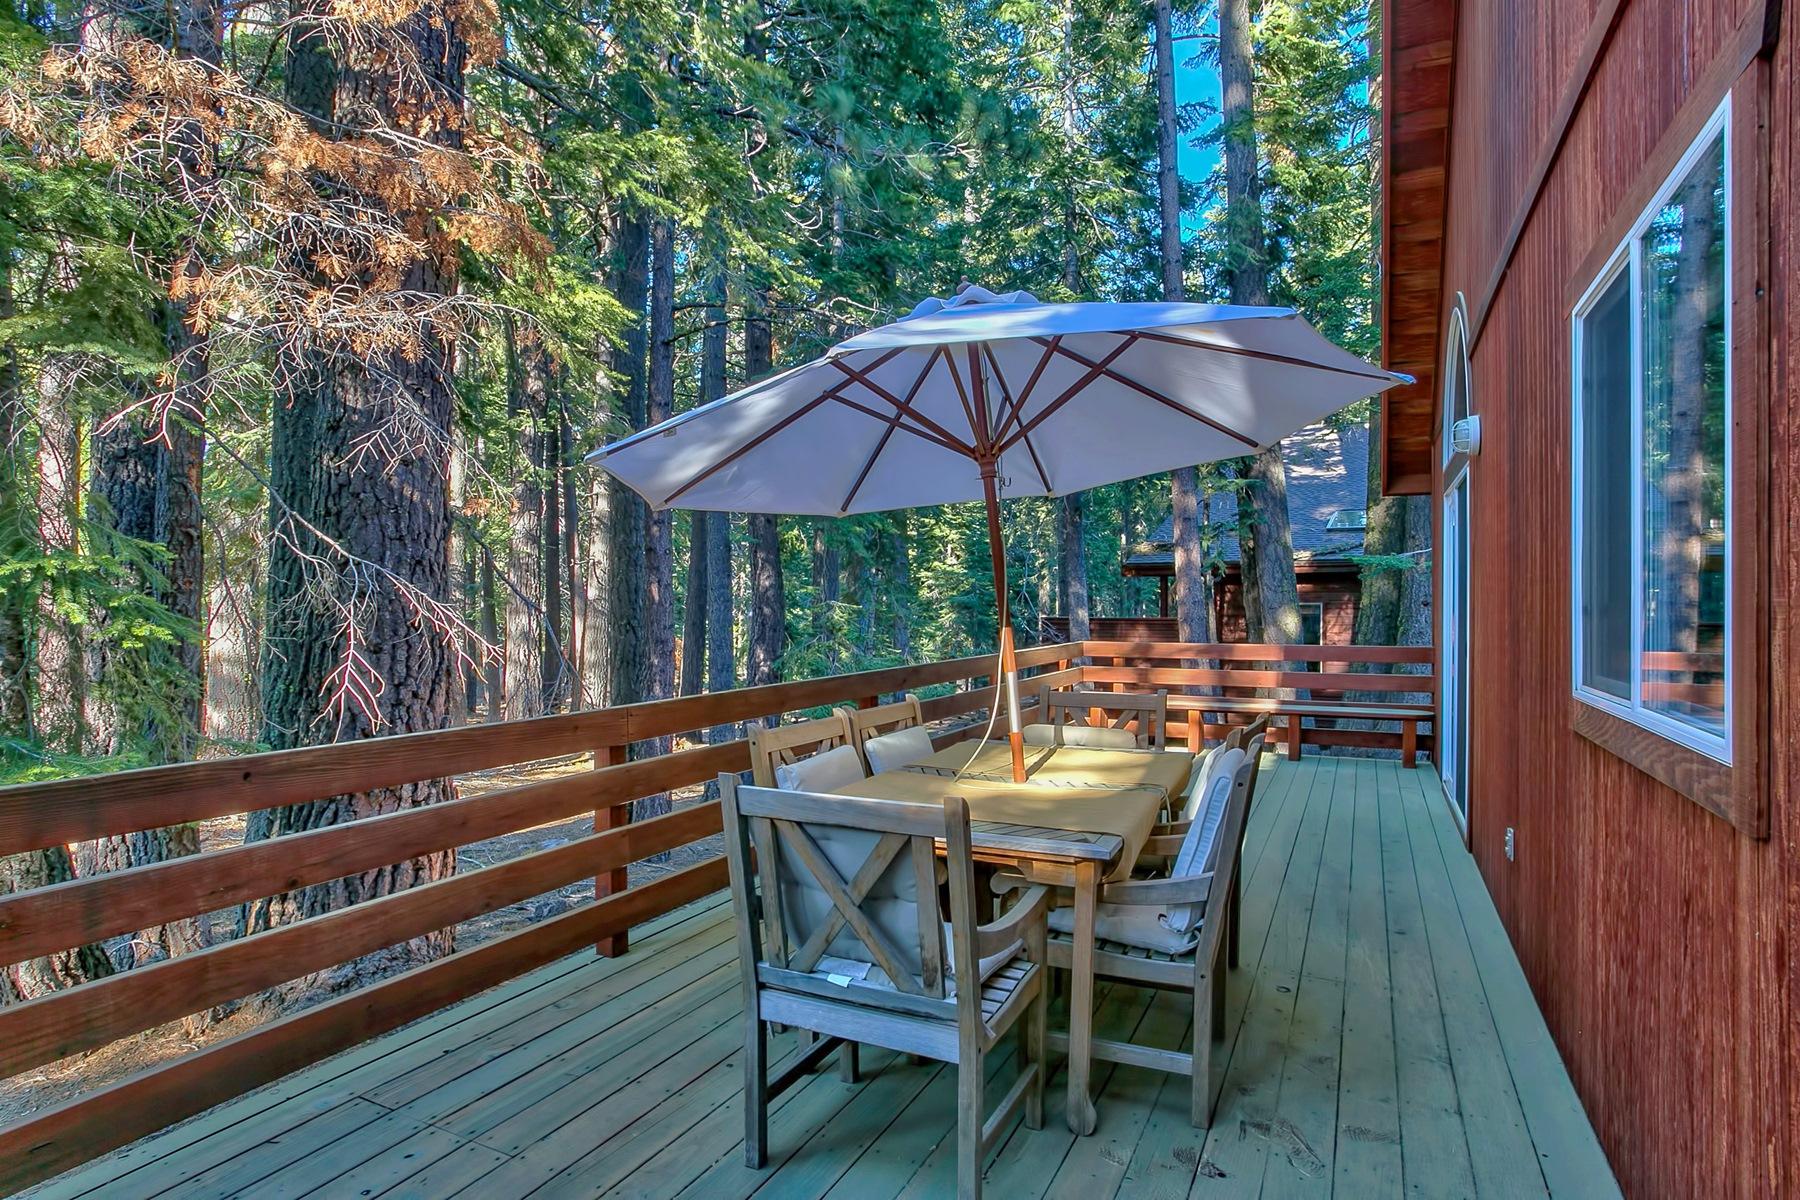 Additional photo for property listing at 14276 Tyrol Road  特拉基, 加利福尼亚州 96161 美国